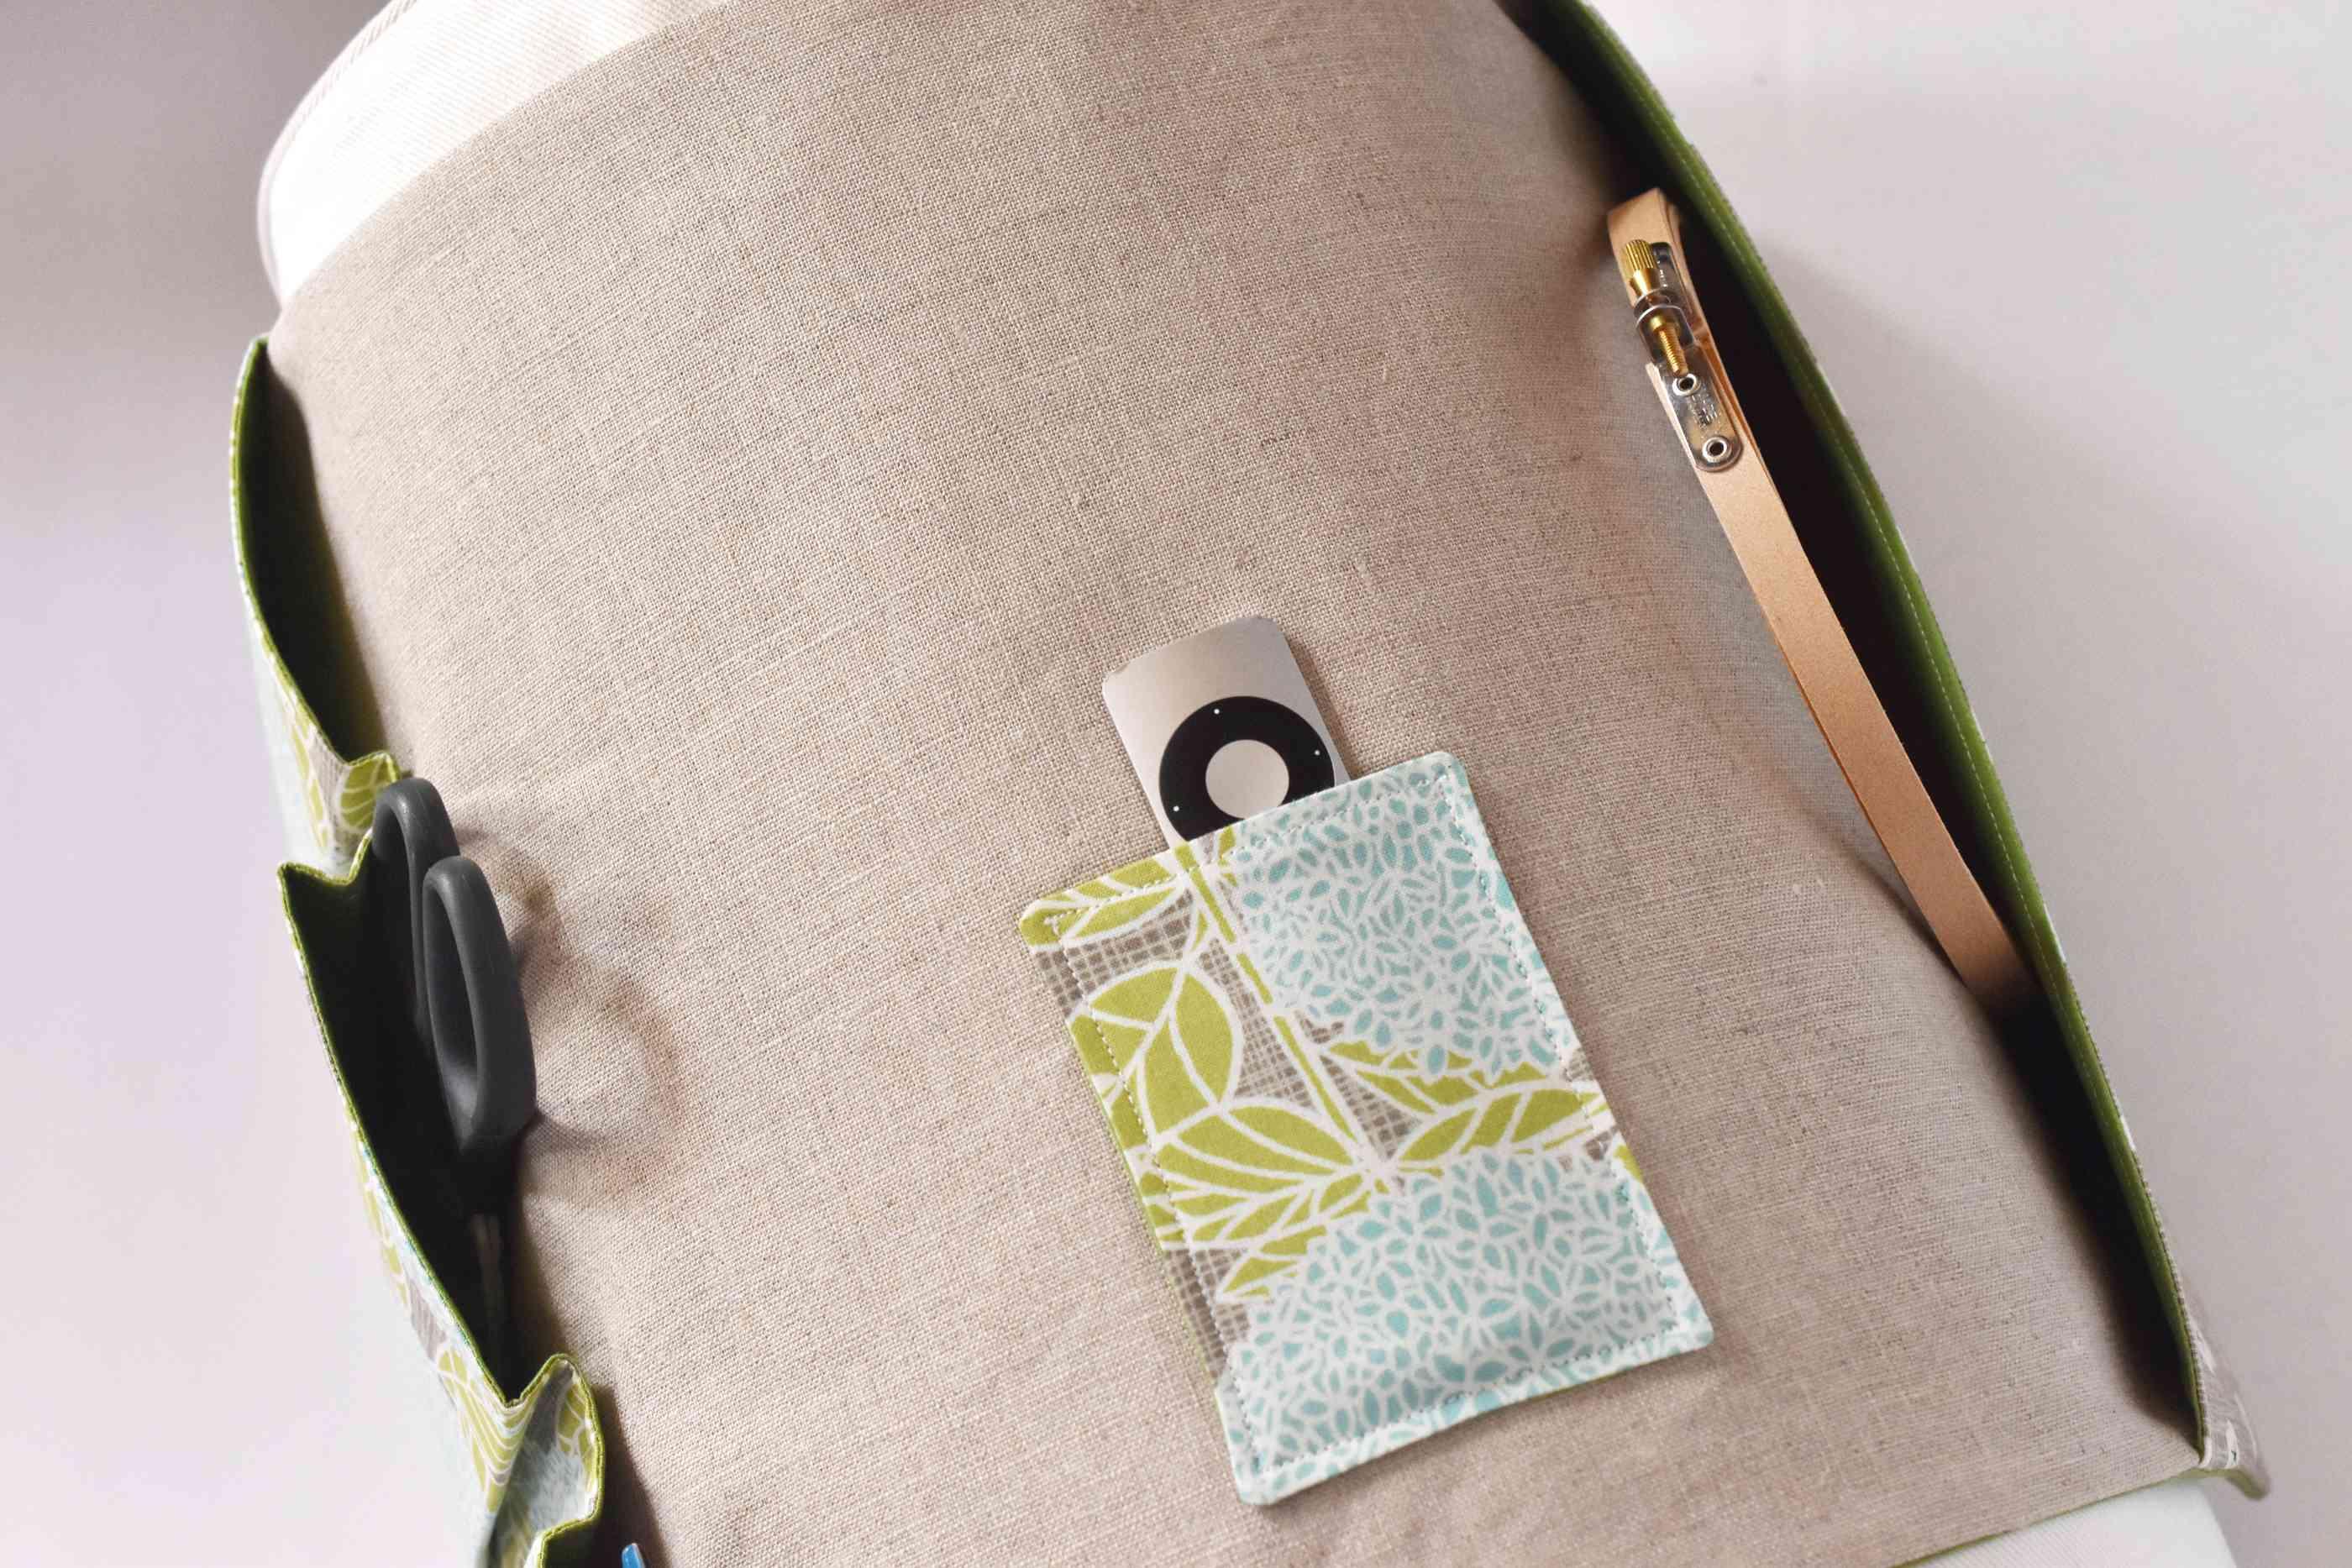 Top Pocket of a DIY Armchair Caddy